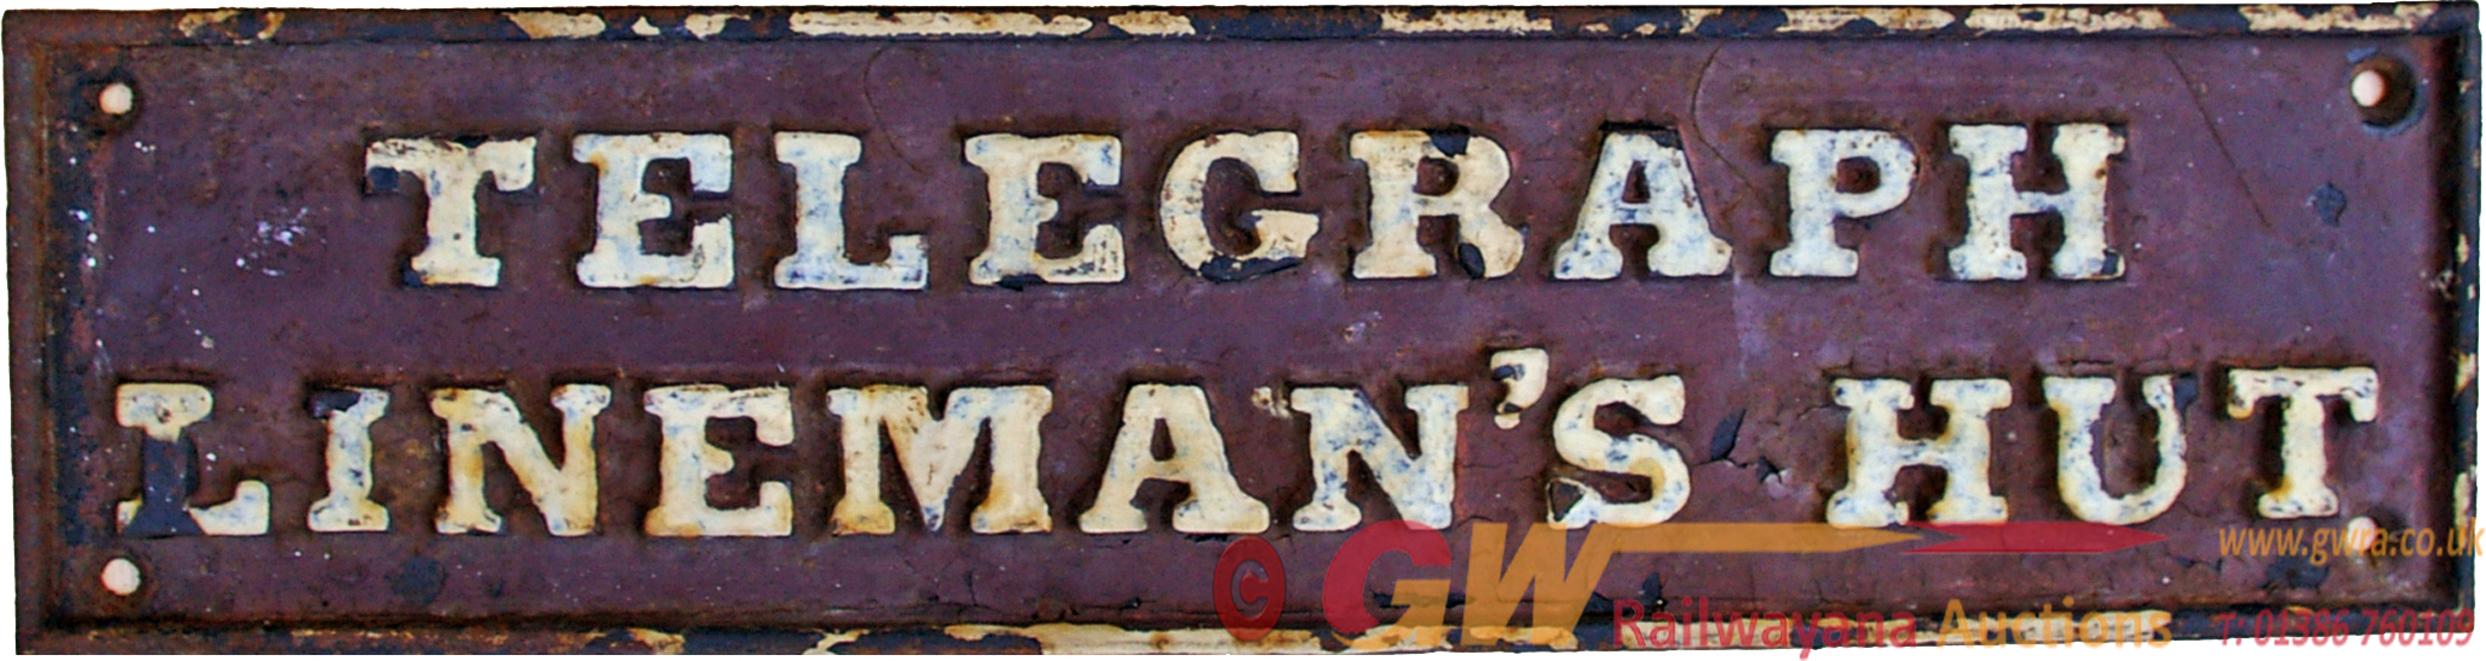 GWR C/I Doorplate TELEGRAPH LINEMAN'S HUT.